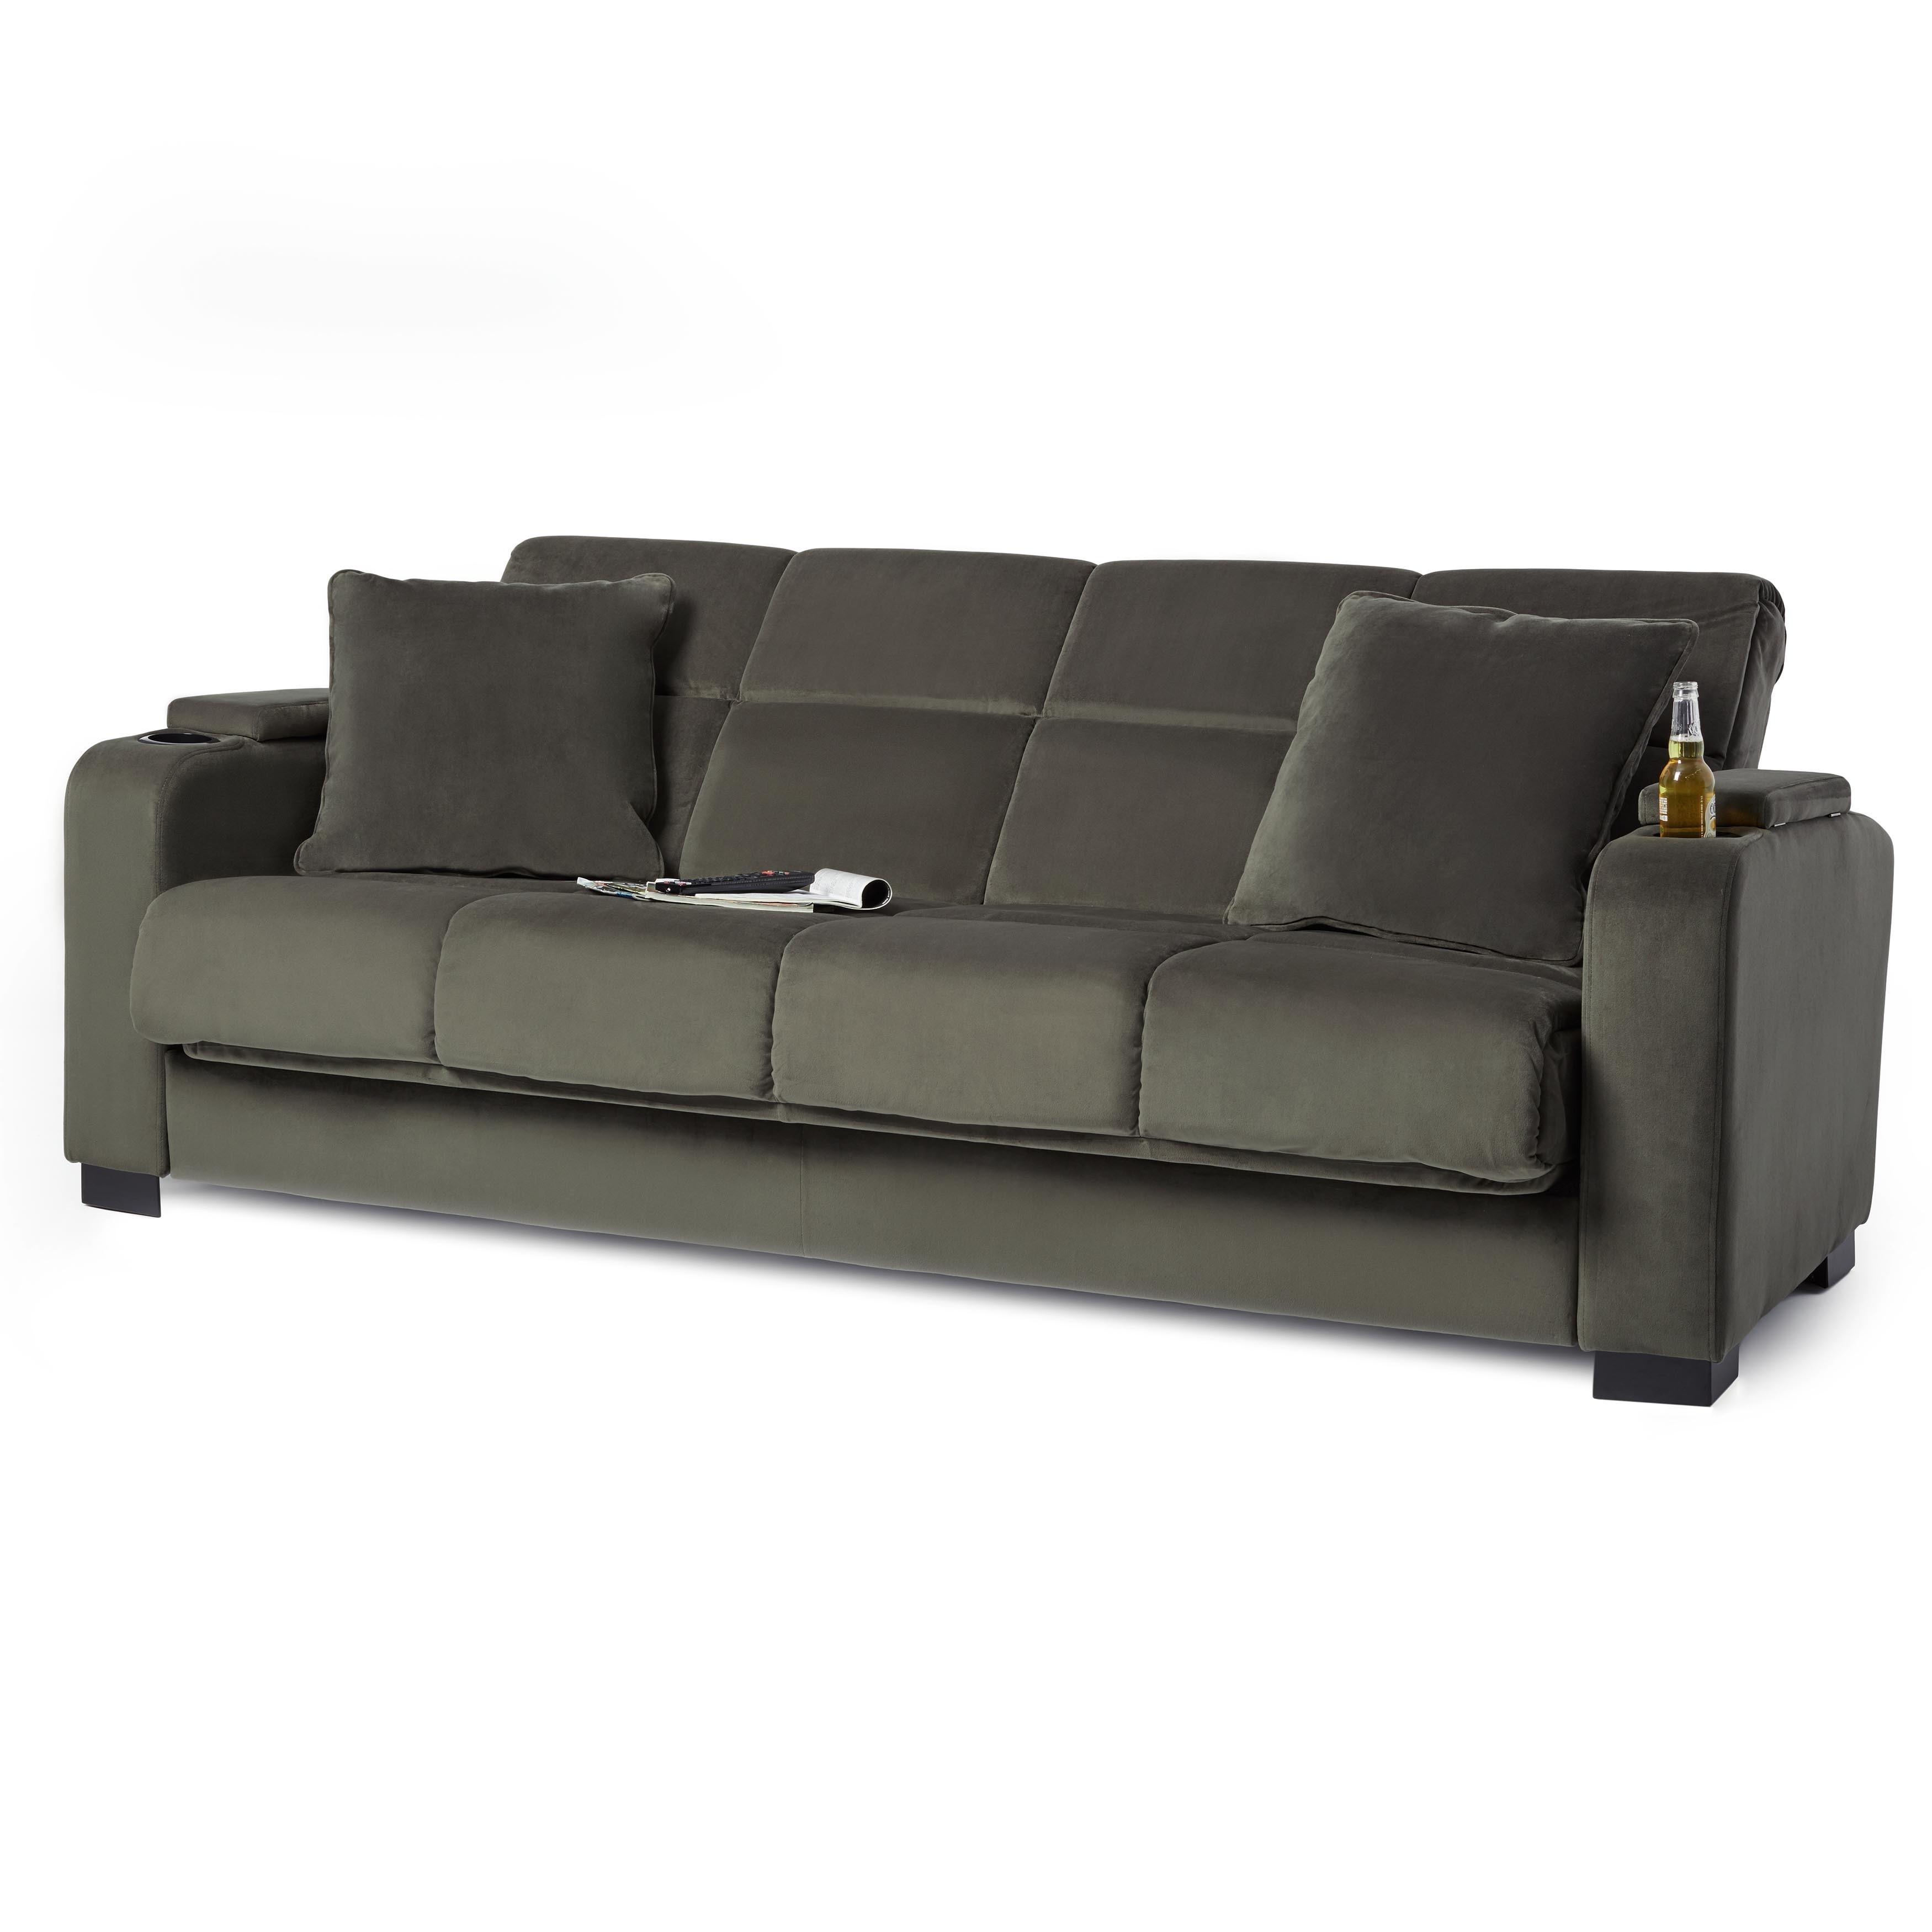 Handy Living Tevin Grey Velvet Convert-a-Couch Futon Sofa Sleeper -  Walmart